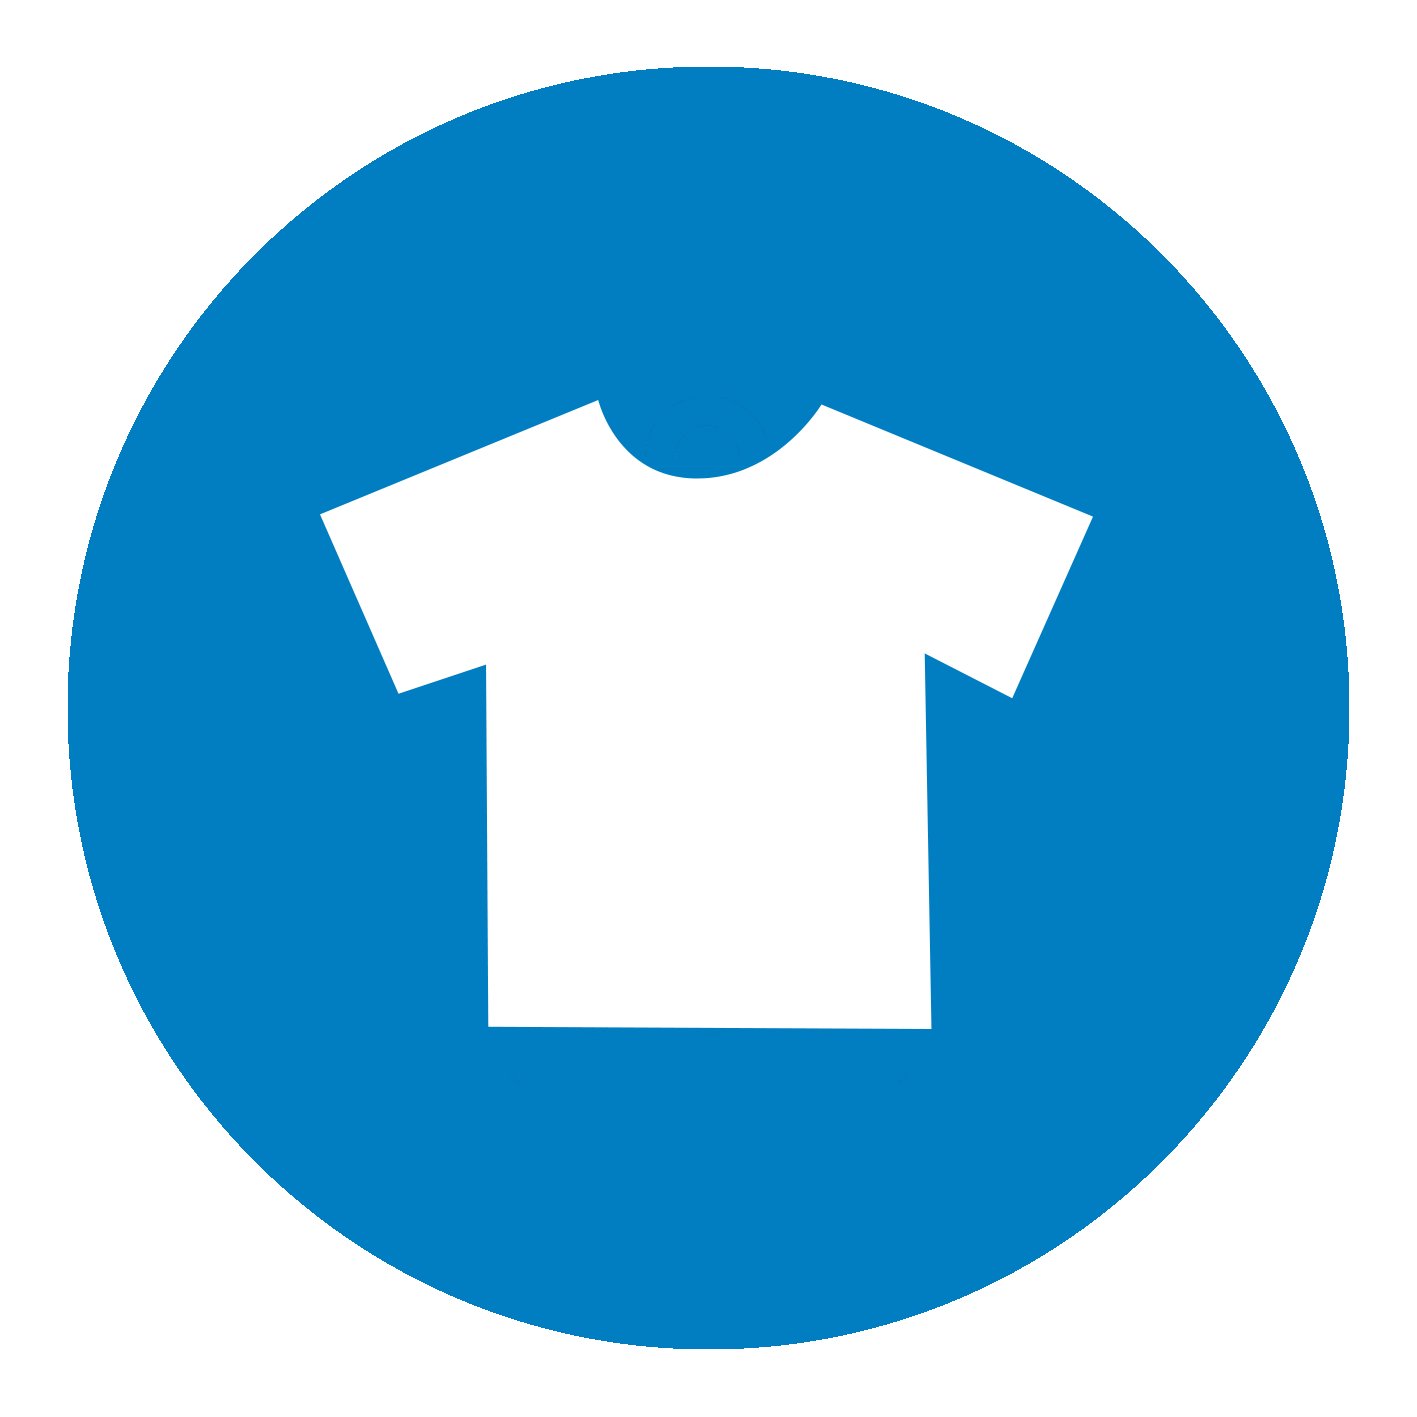 Kleindungsverschwendung: Beispiel T-Shirt